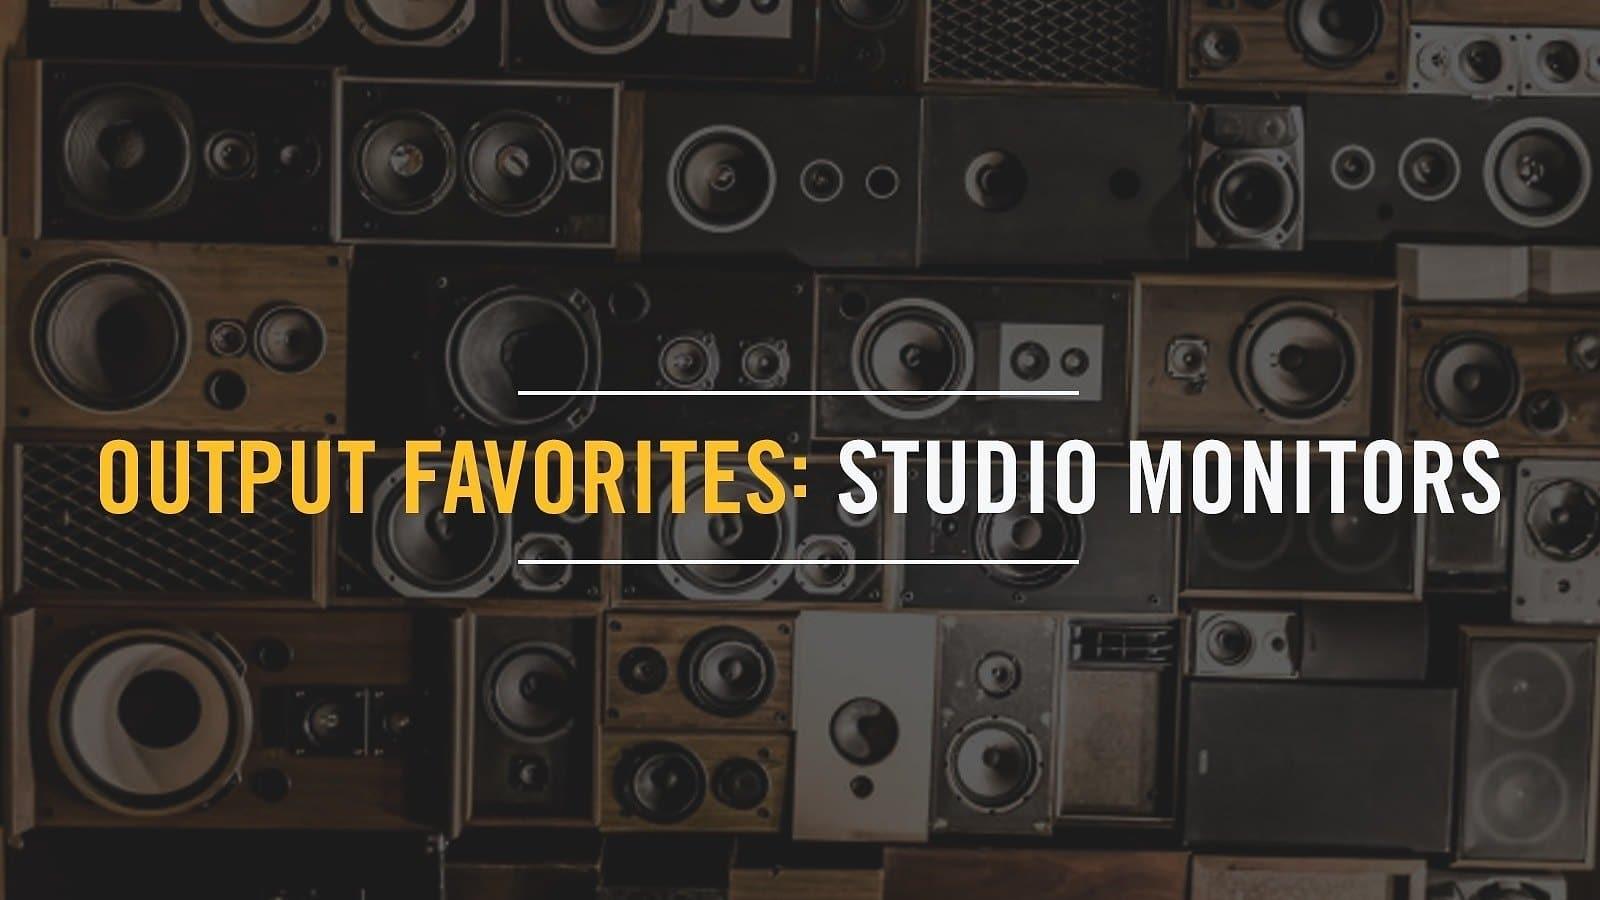 Output Favorites: Studio Monitors